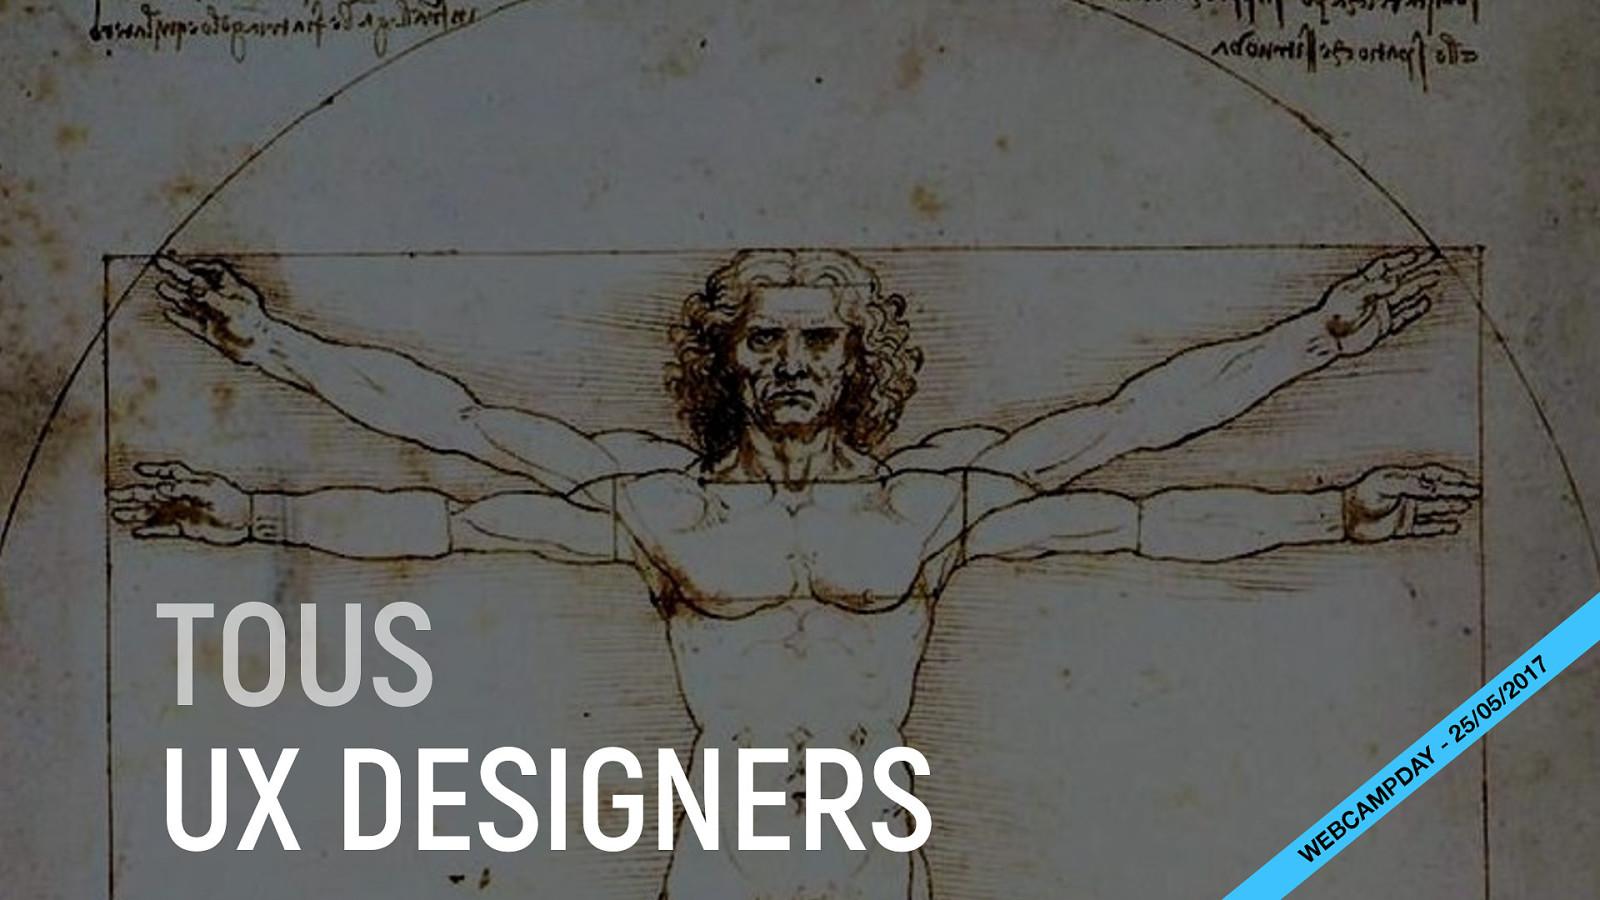 Tous UX designers !